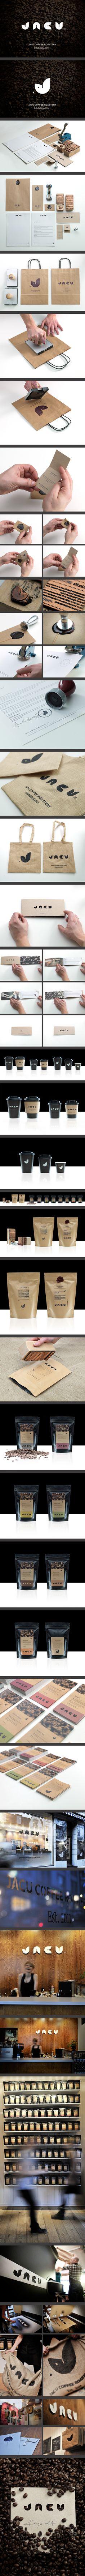 Jacu Coffee Roastery - Visual identity/Branding / Tom Emil Olsen